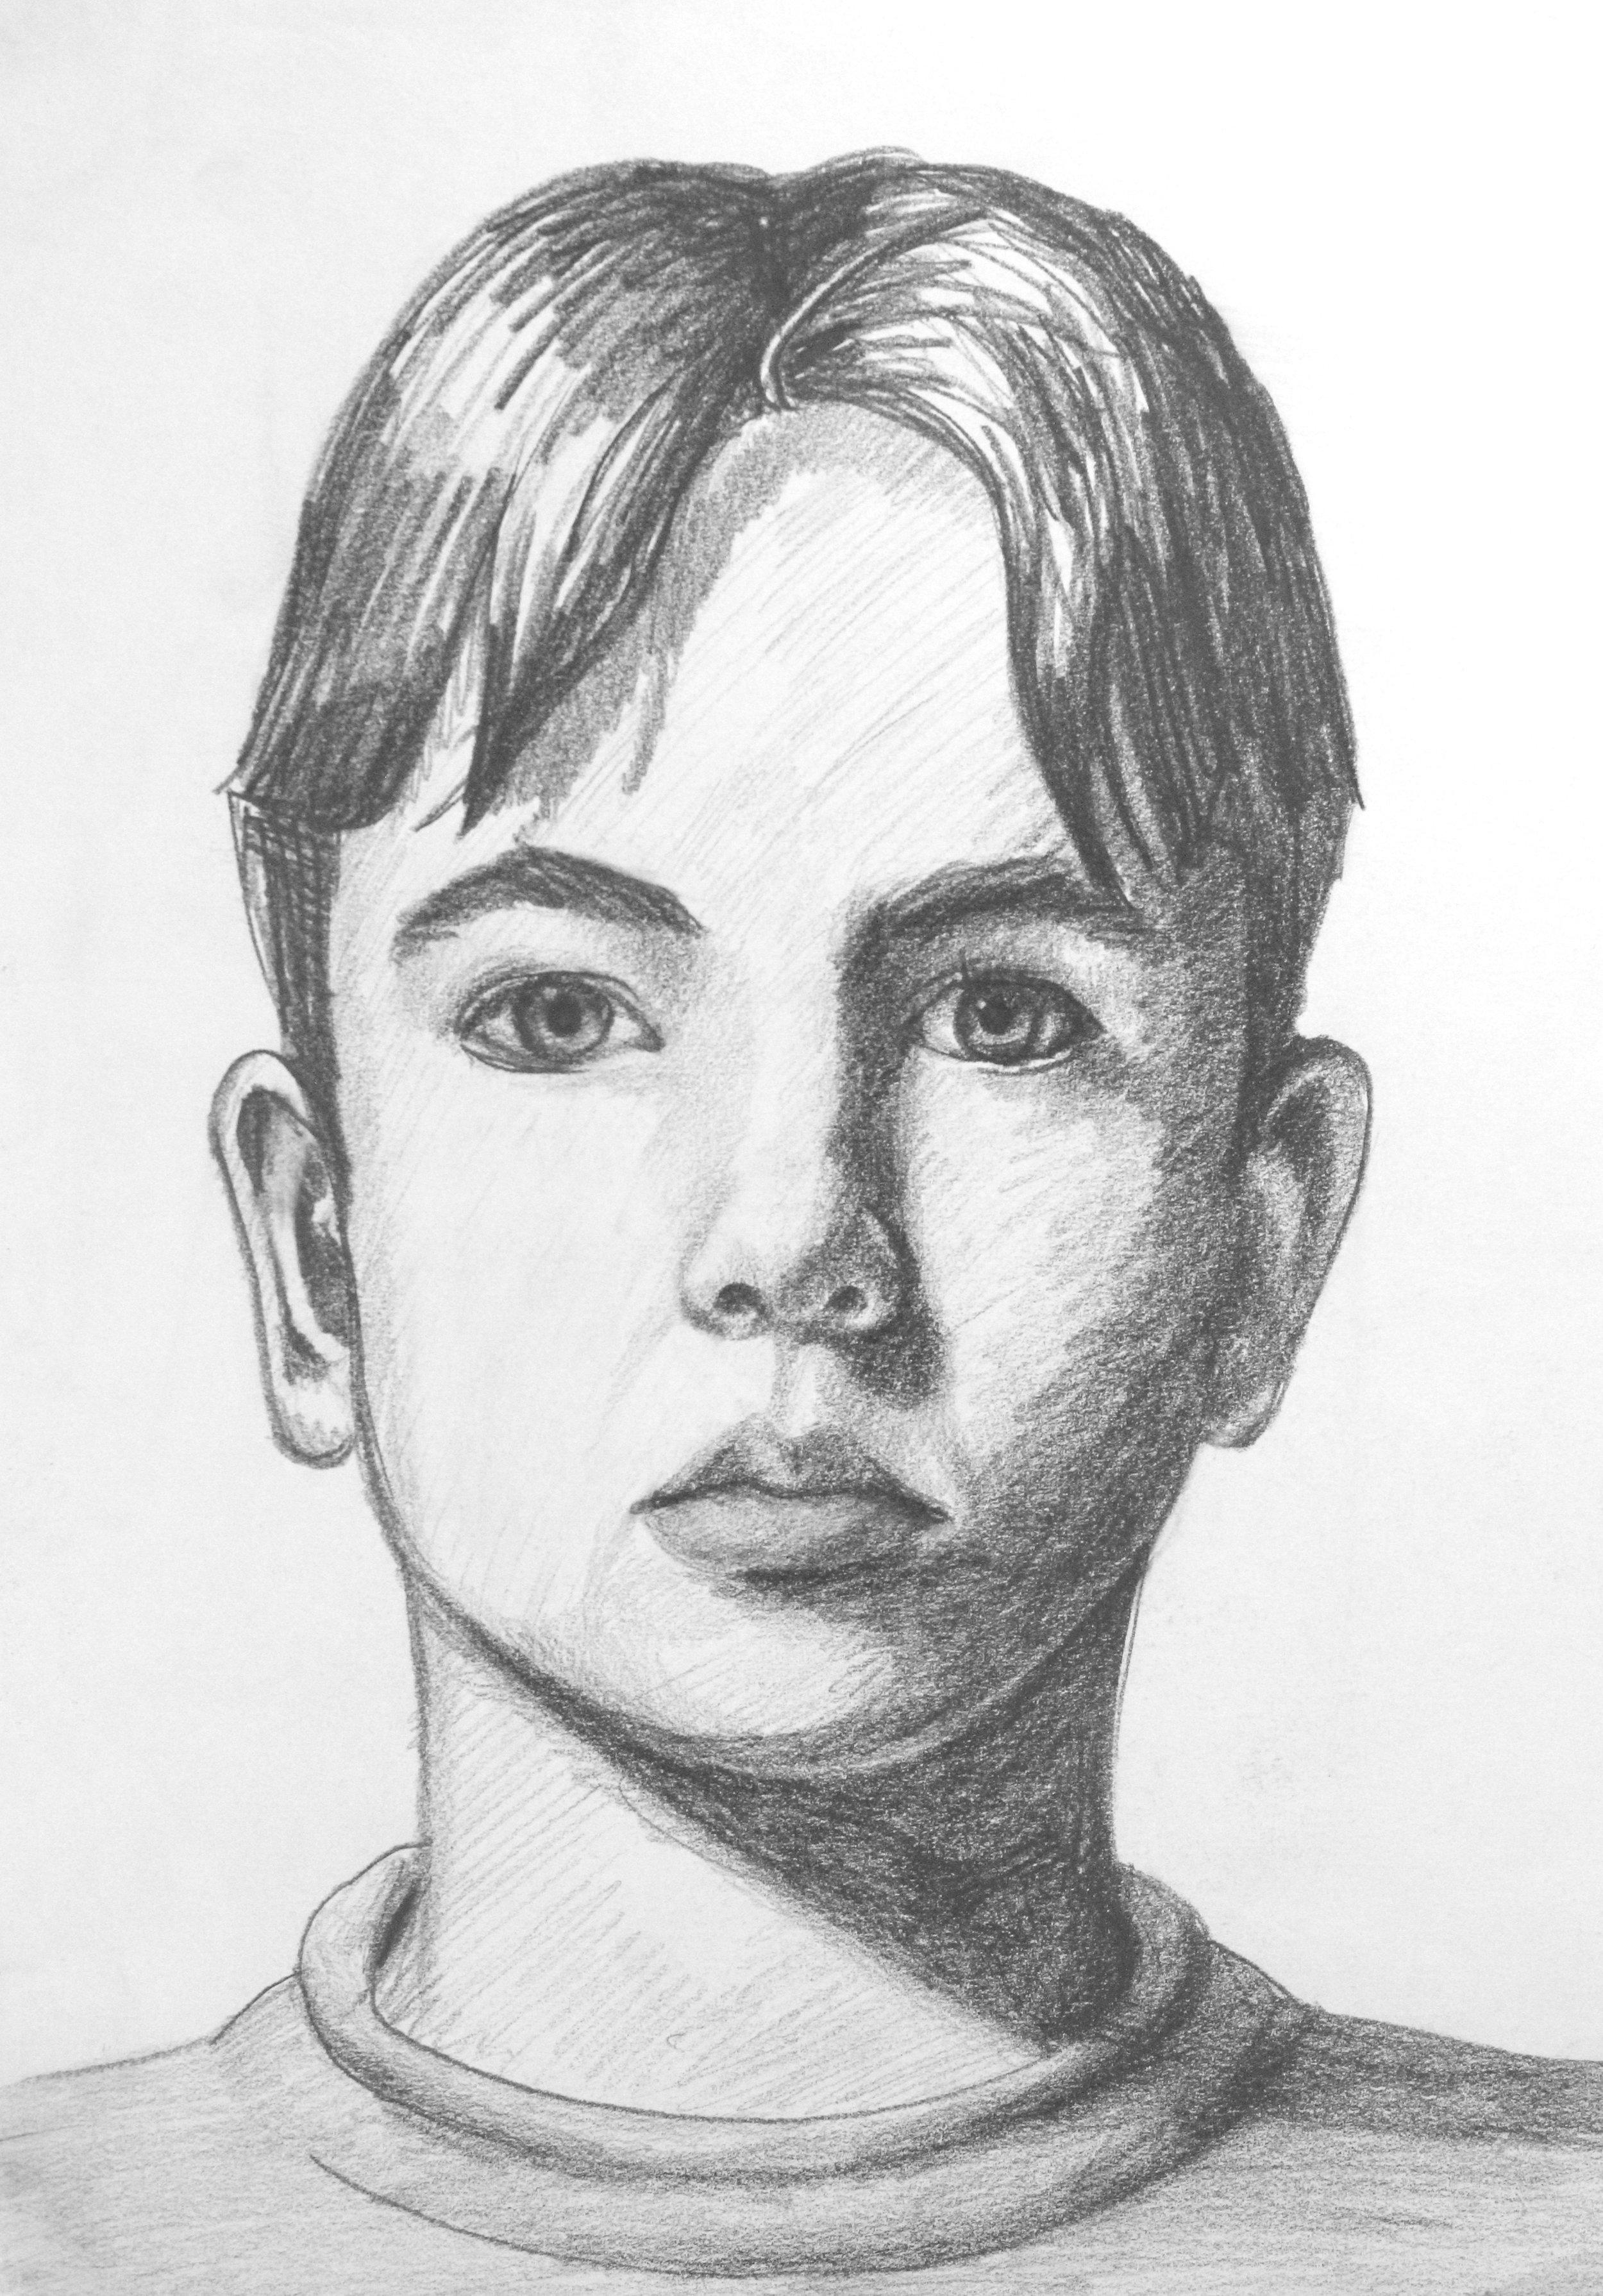 Self portrait, aged 11